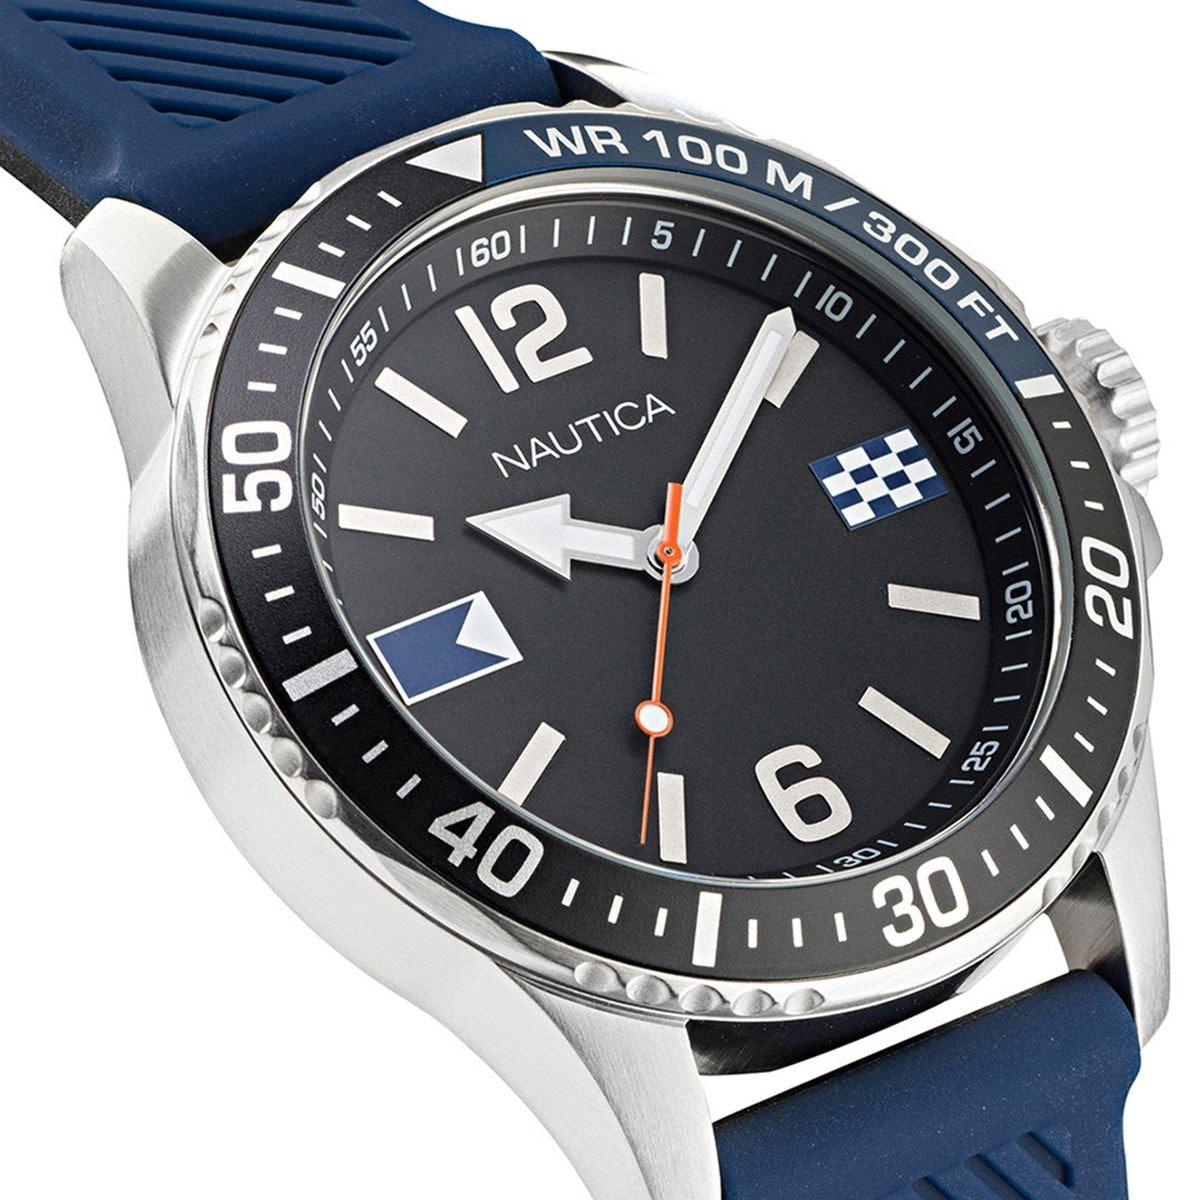 Reloj Nautica Azul Navy NAPFRB920 Para Caballero